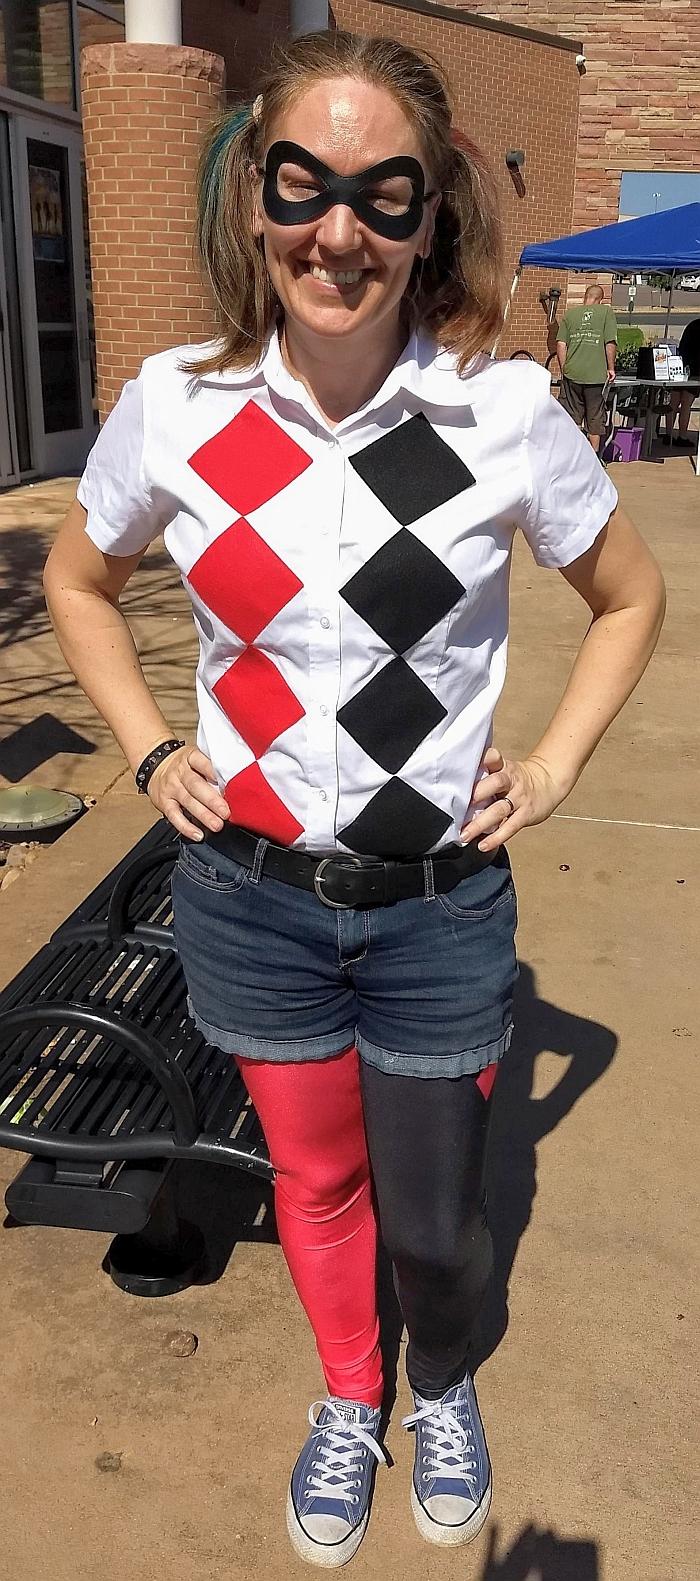 DCSHG Harley Quinn at WPL Mini-Con 2018